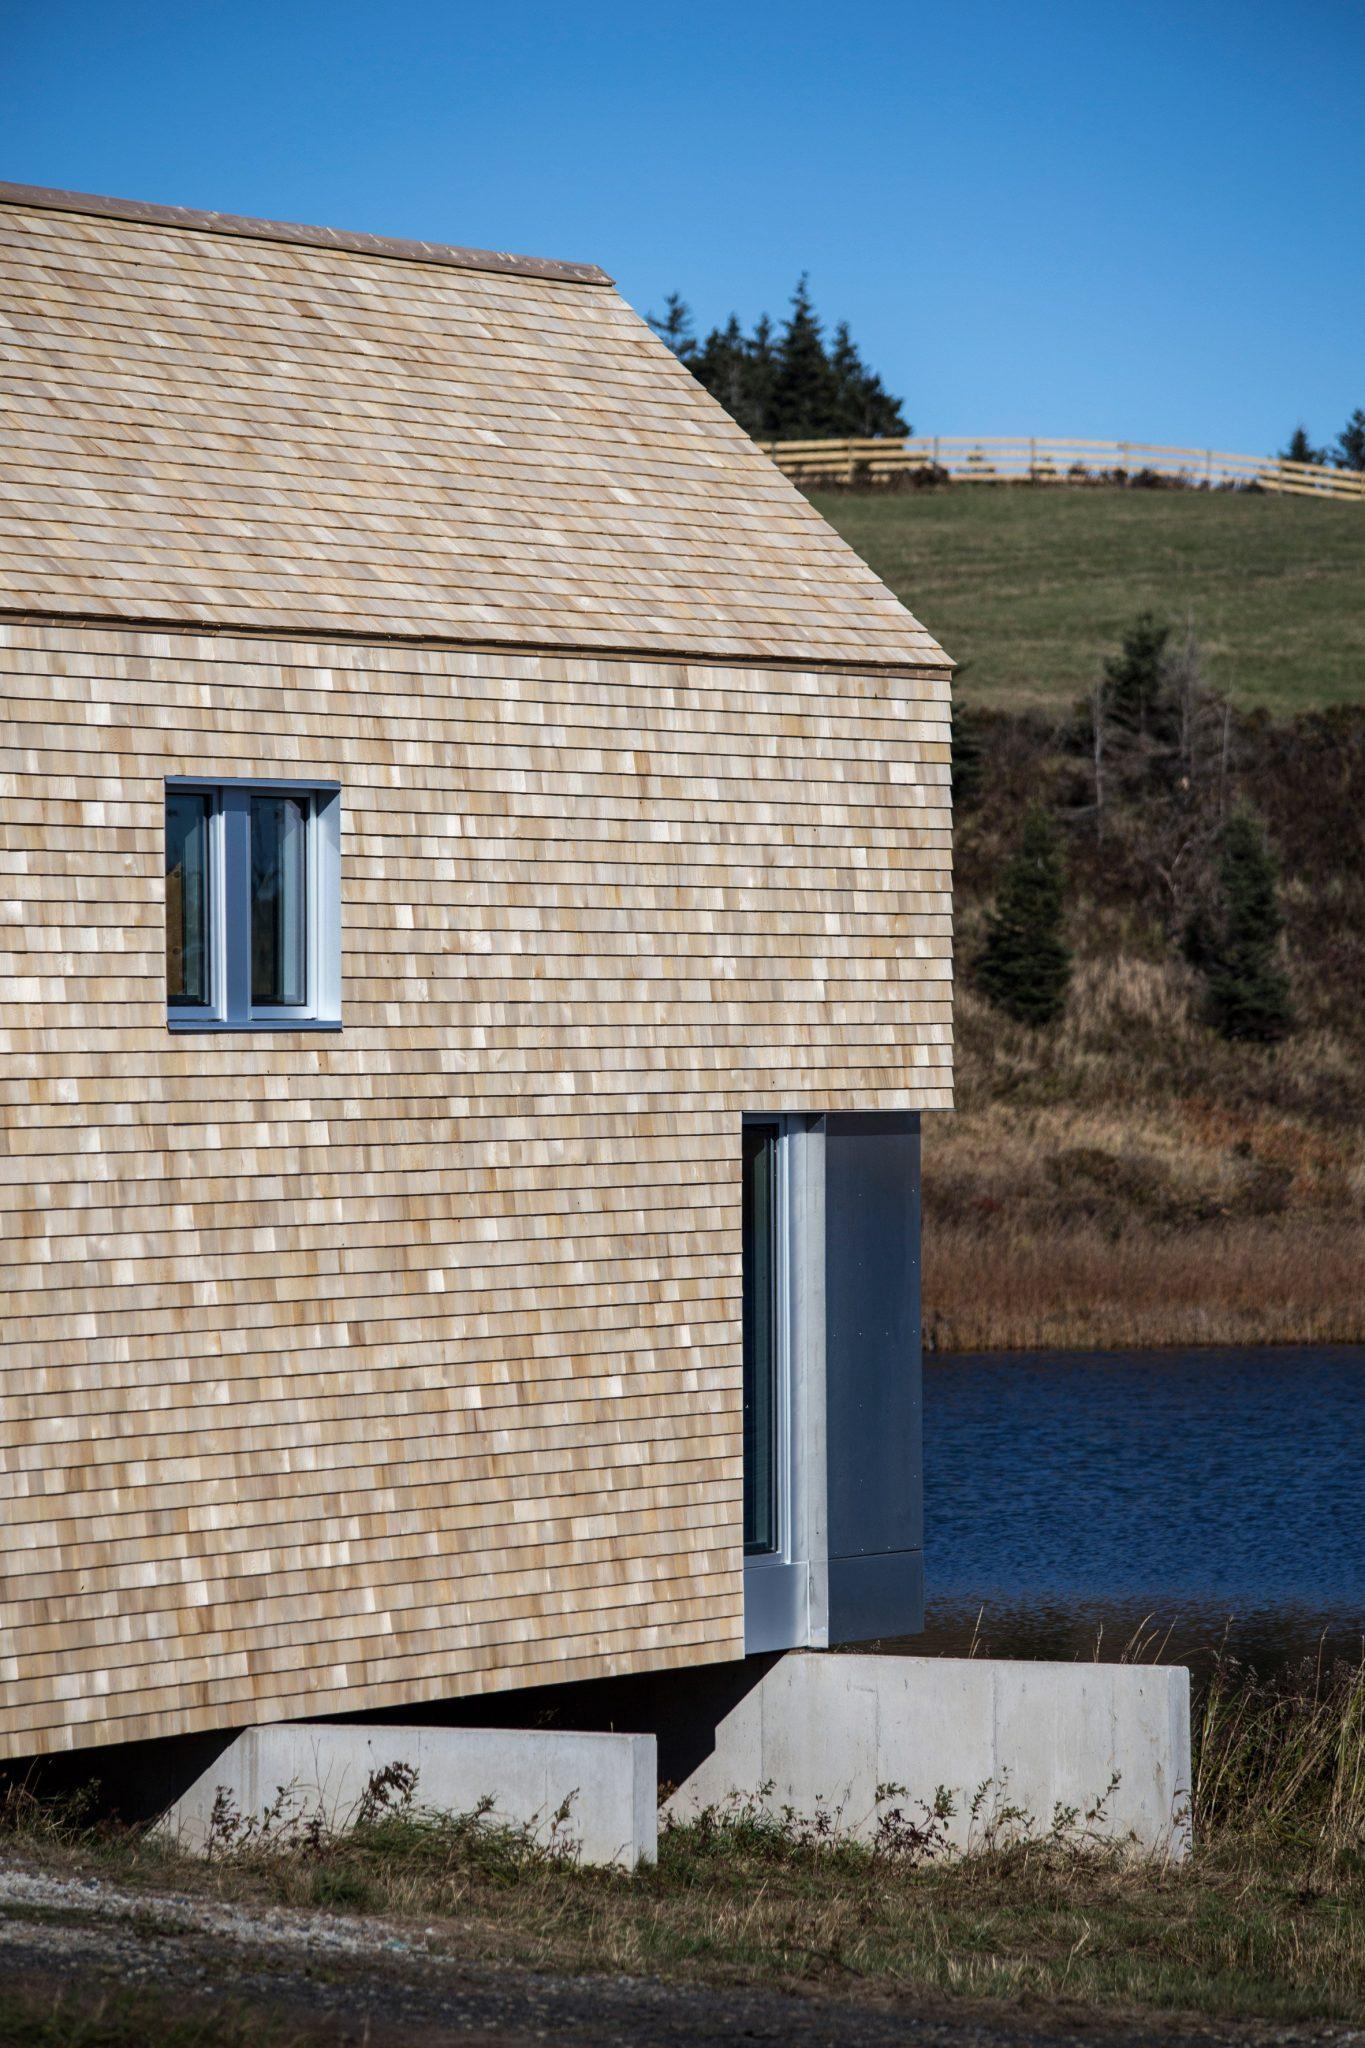 dreamy coastal house by studio mackay lyons sweetapple 4 Dreamy Coastal House by Studio MacKay Lyons Sweetapple